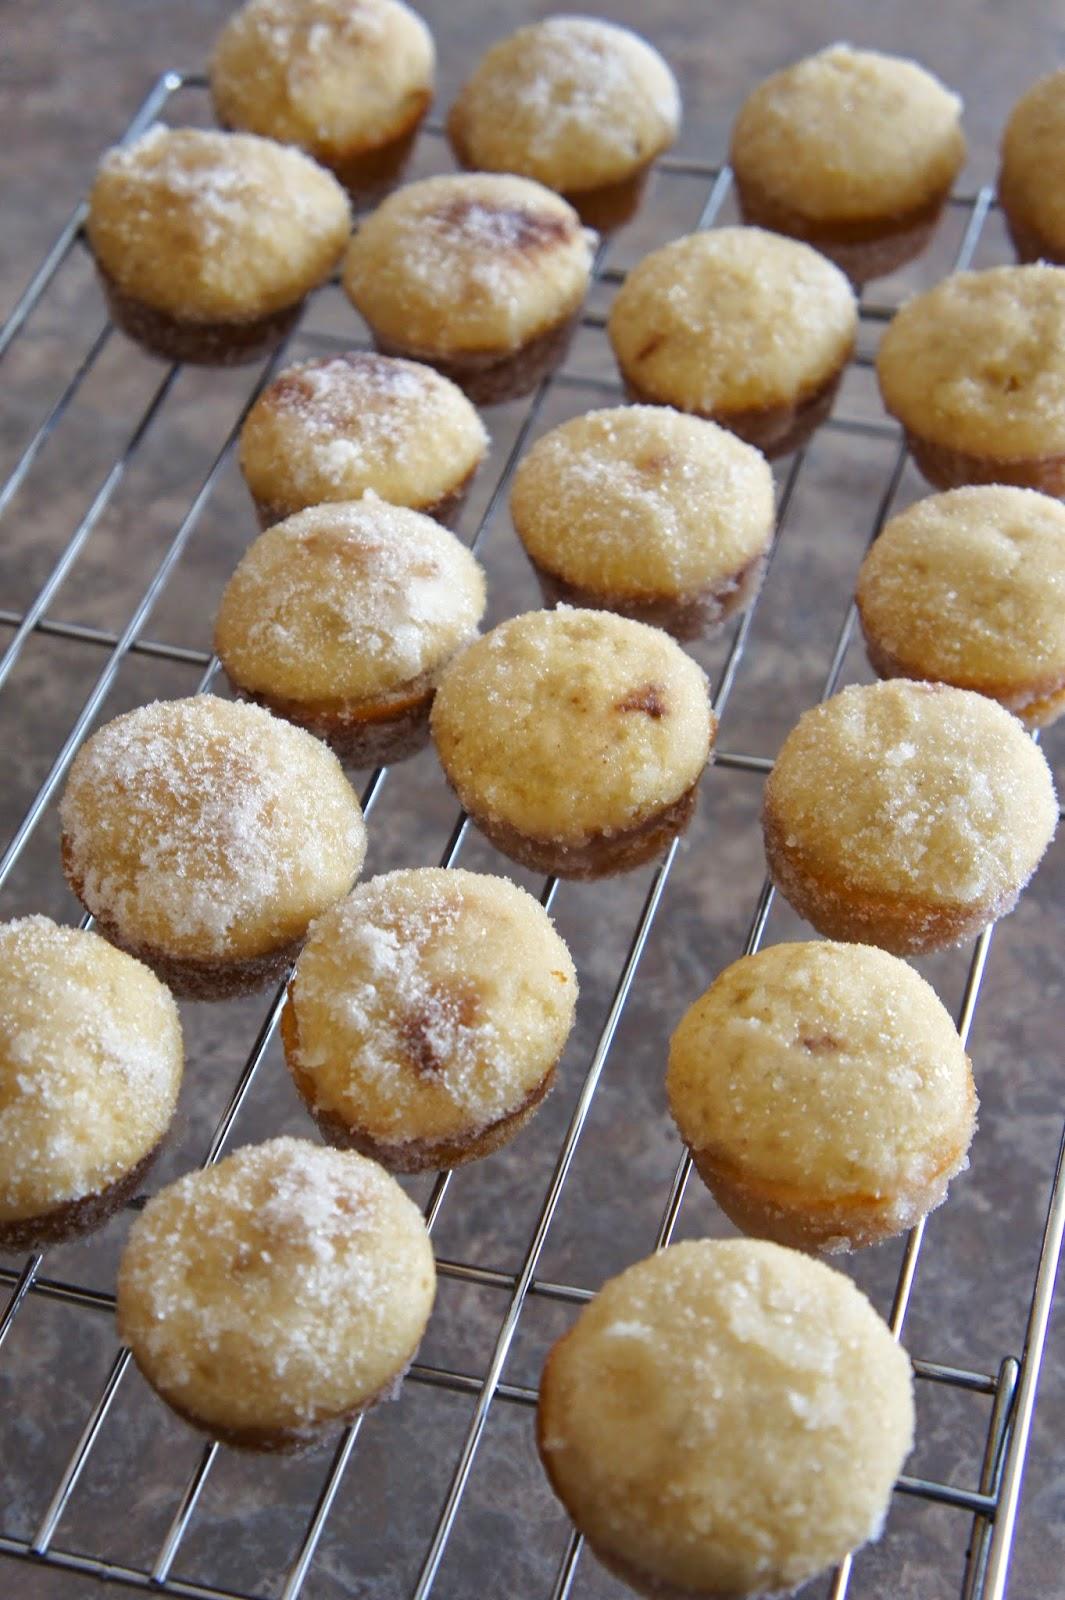 Mocha Cappuccino Hazelut Stuffed Doughnut Holes: Savory Sweet and Satisfying